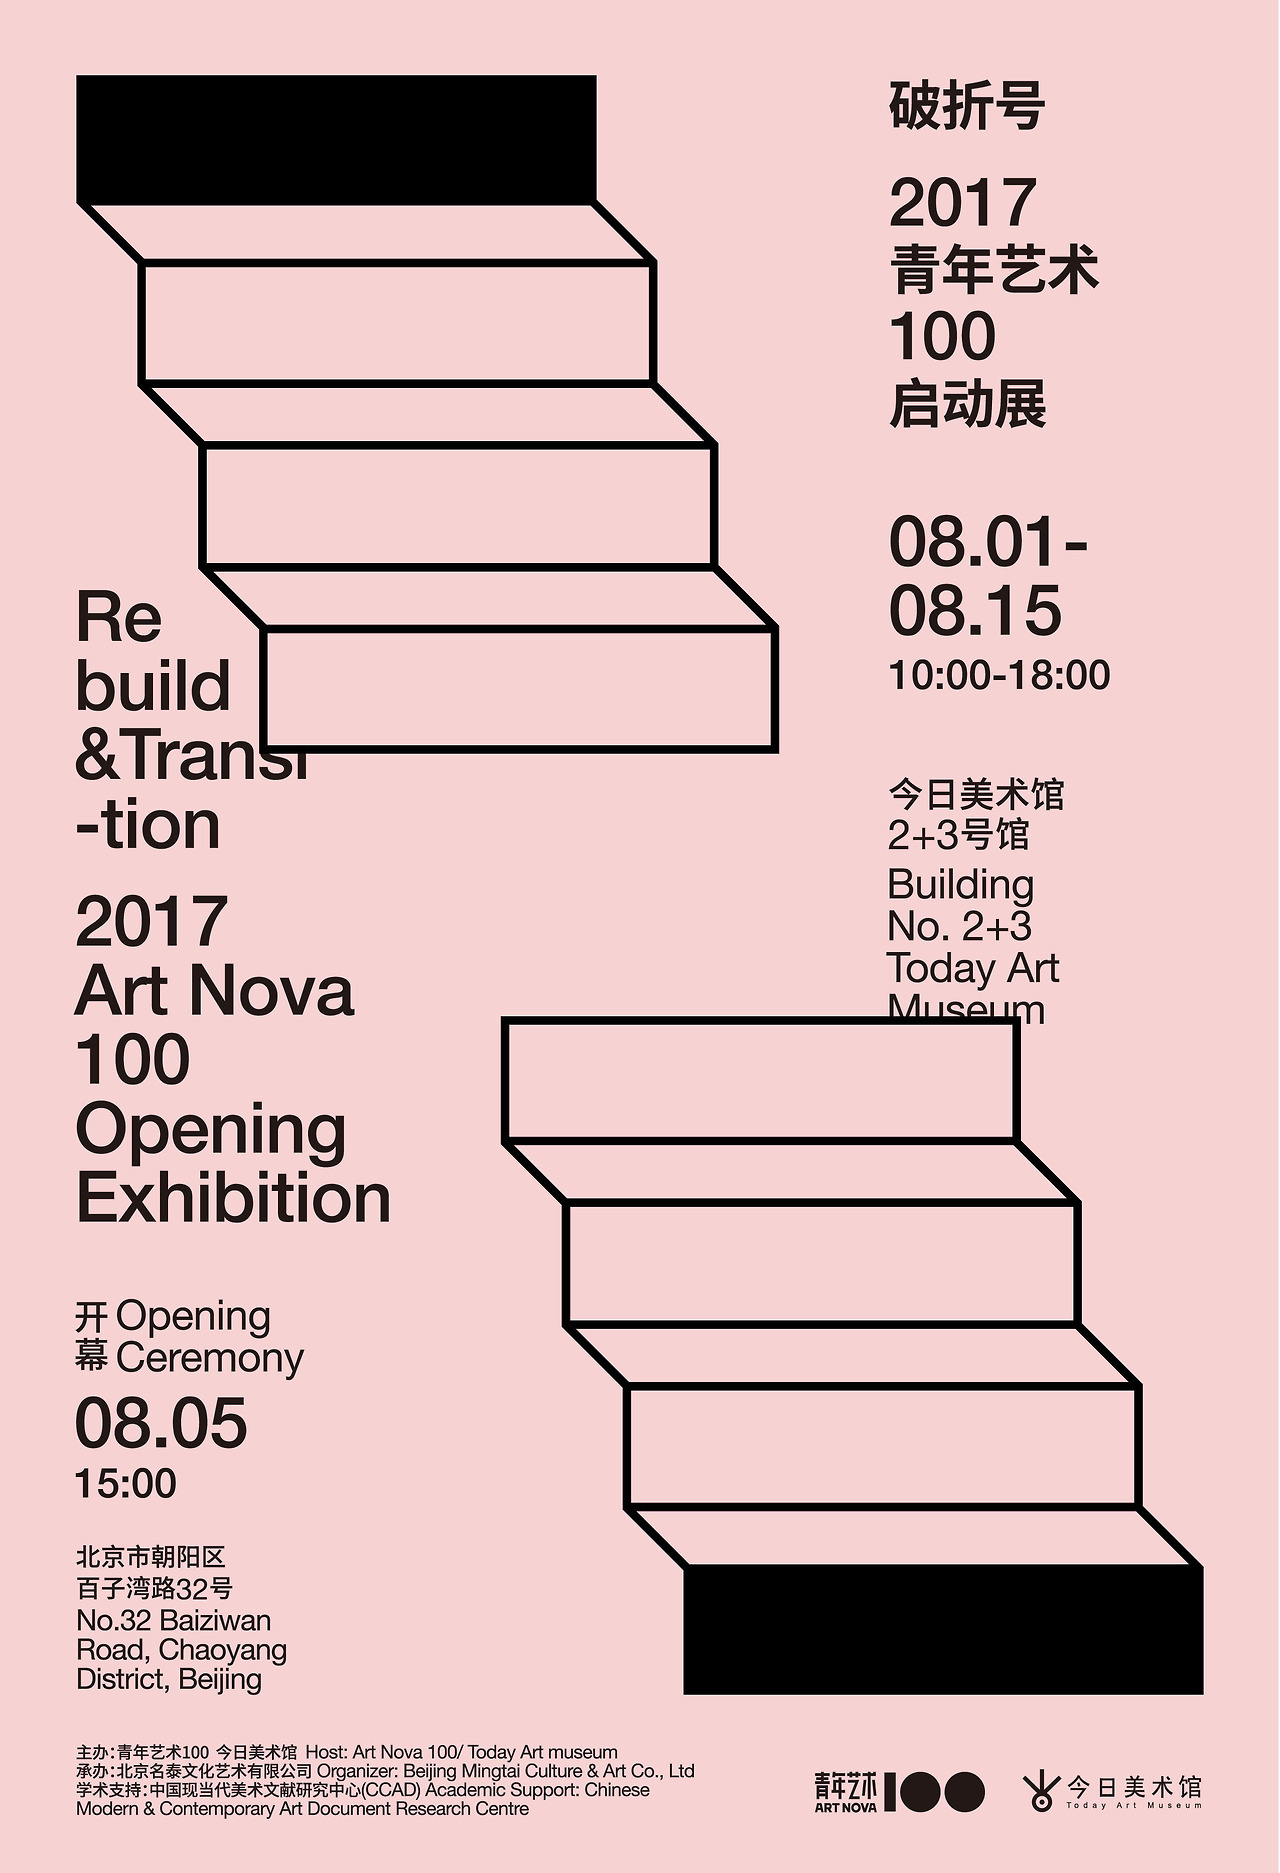 09 Art Nova 100